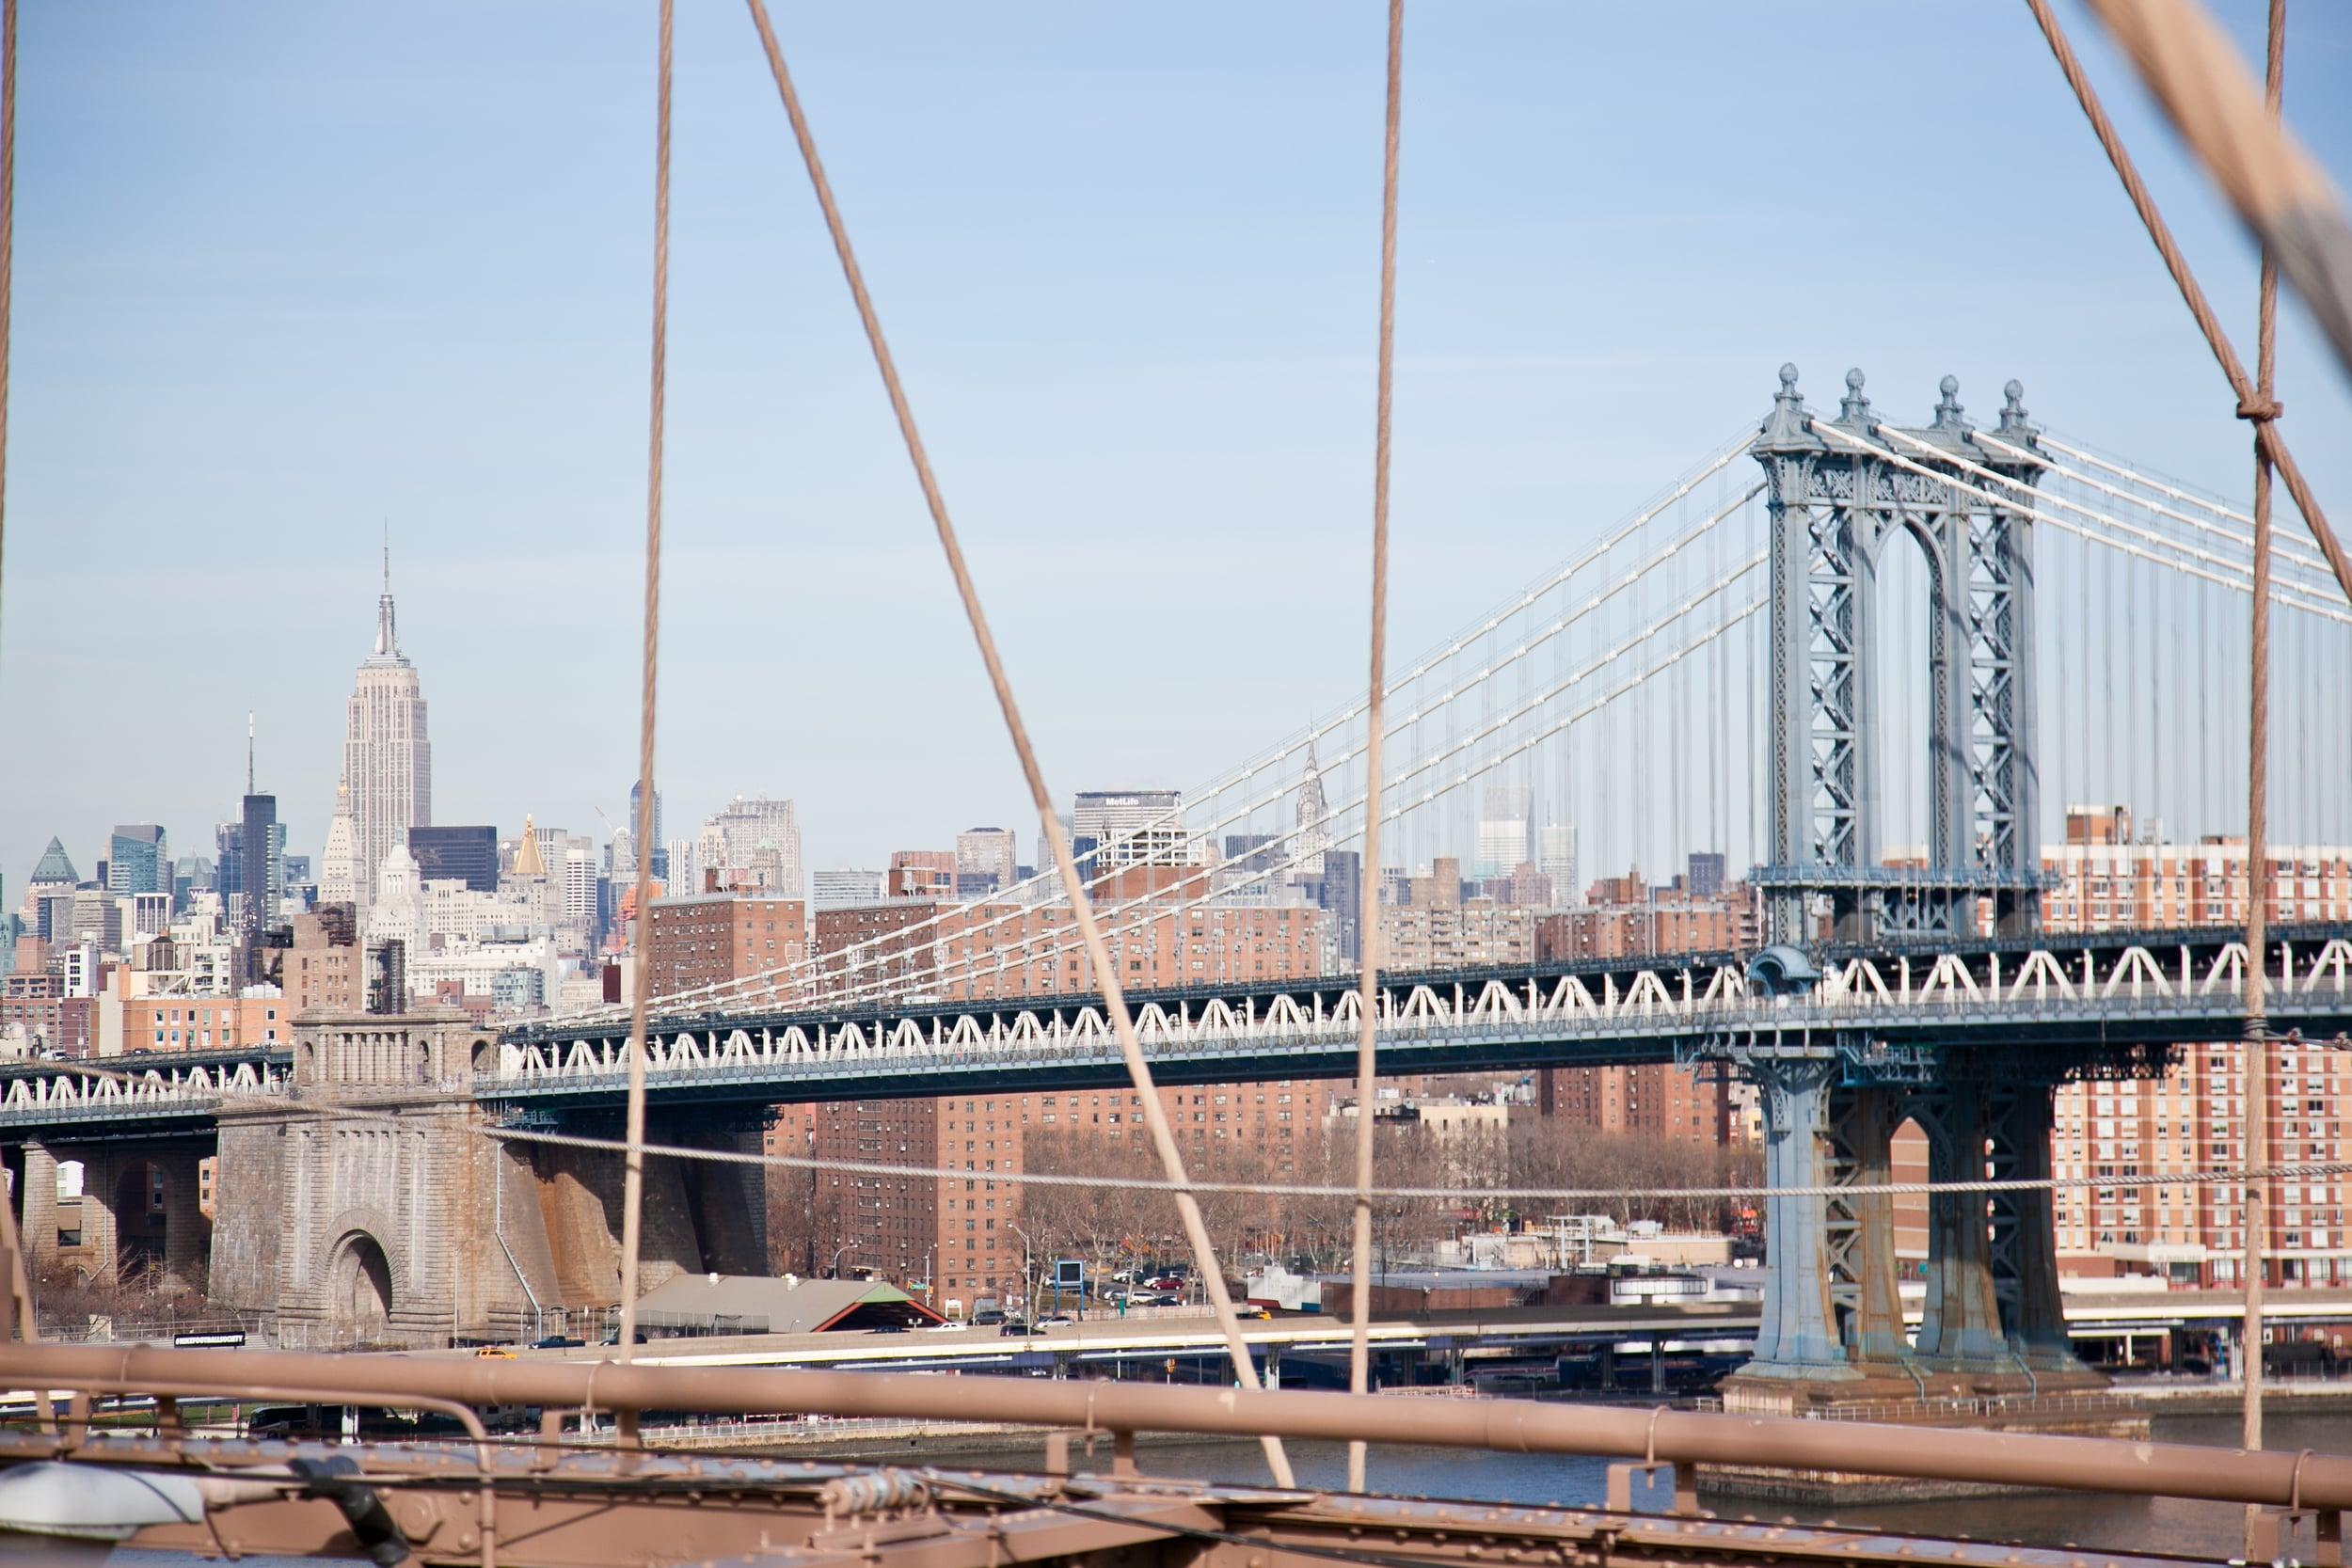 trisa-taro-view-from-brooklyn-bridge-new york city.jpg